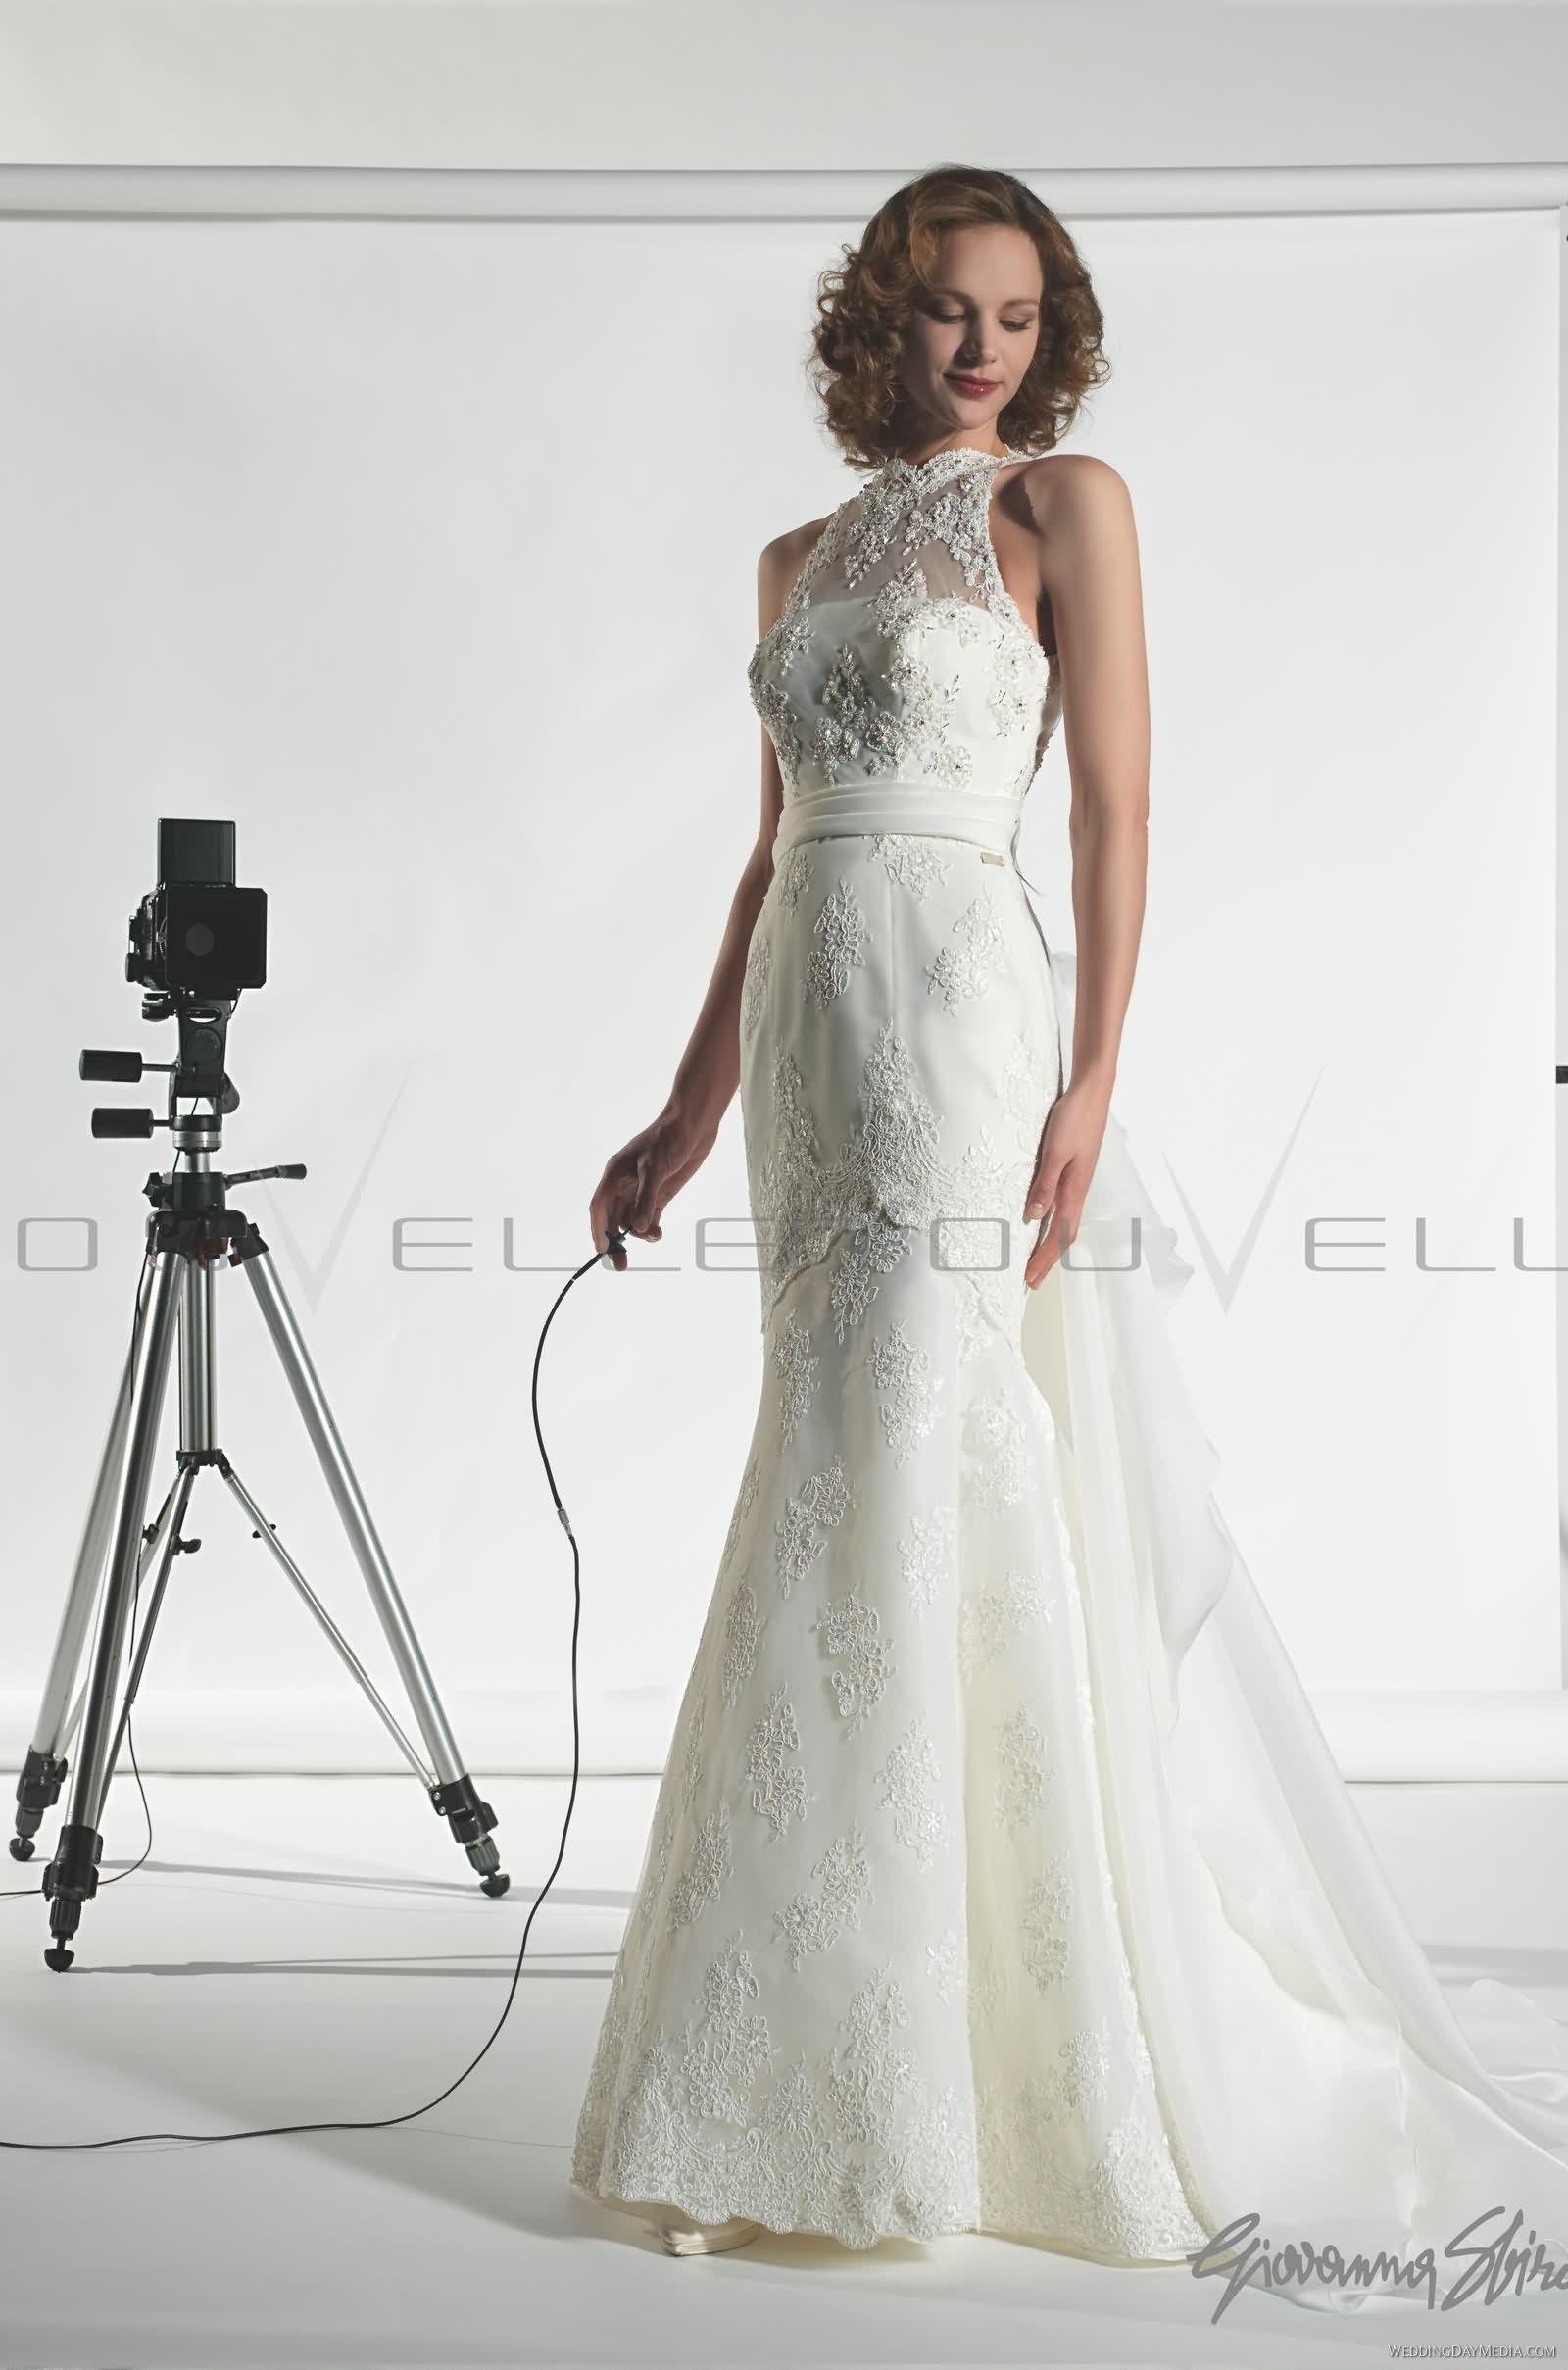 Giovanna Sbiroli 95210 Giovanna Sbiroli Wedding Dresses Nouvelle $232.32 Giovanna Sbiroli